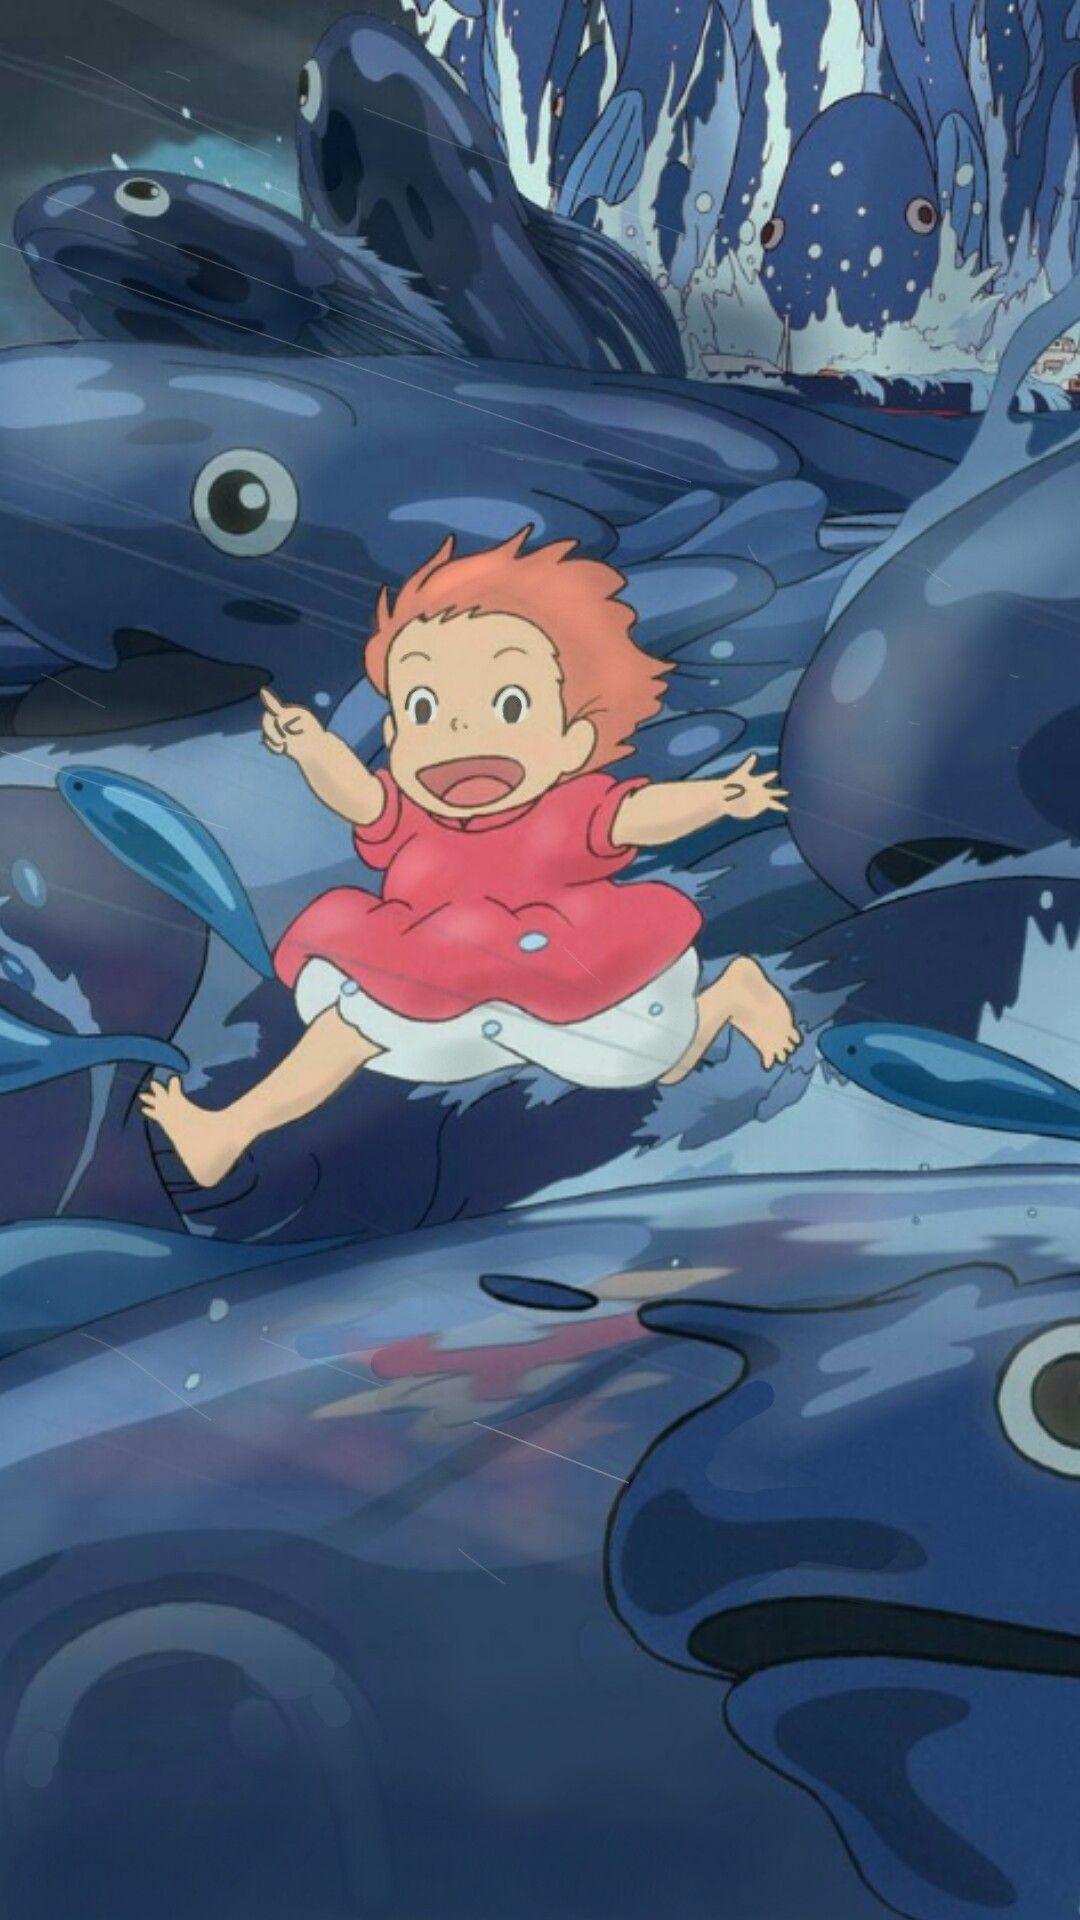 Studio Ghibli Anime Movie Scenery Wallpapers Lockscreens